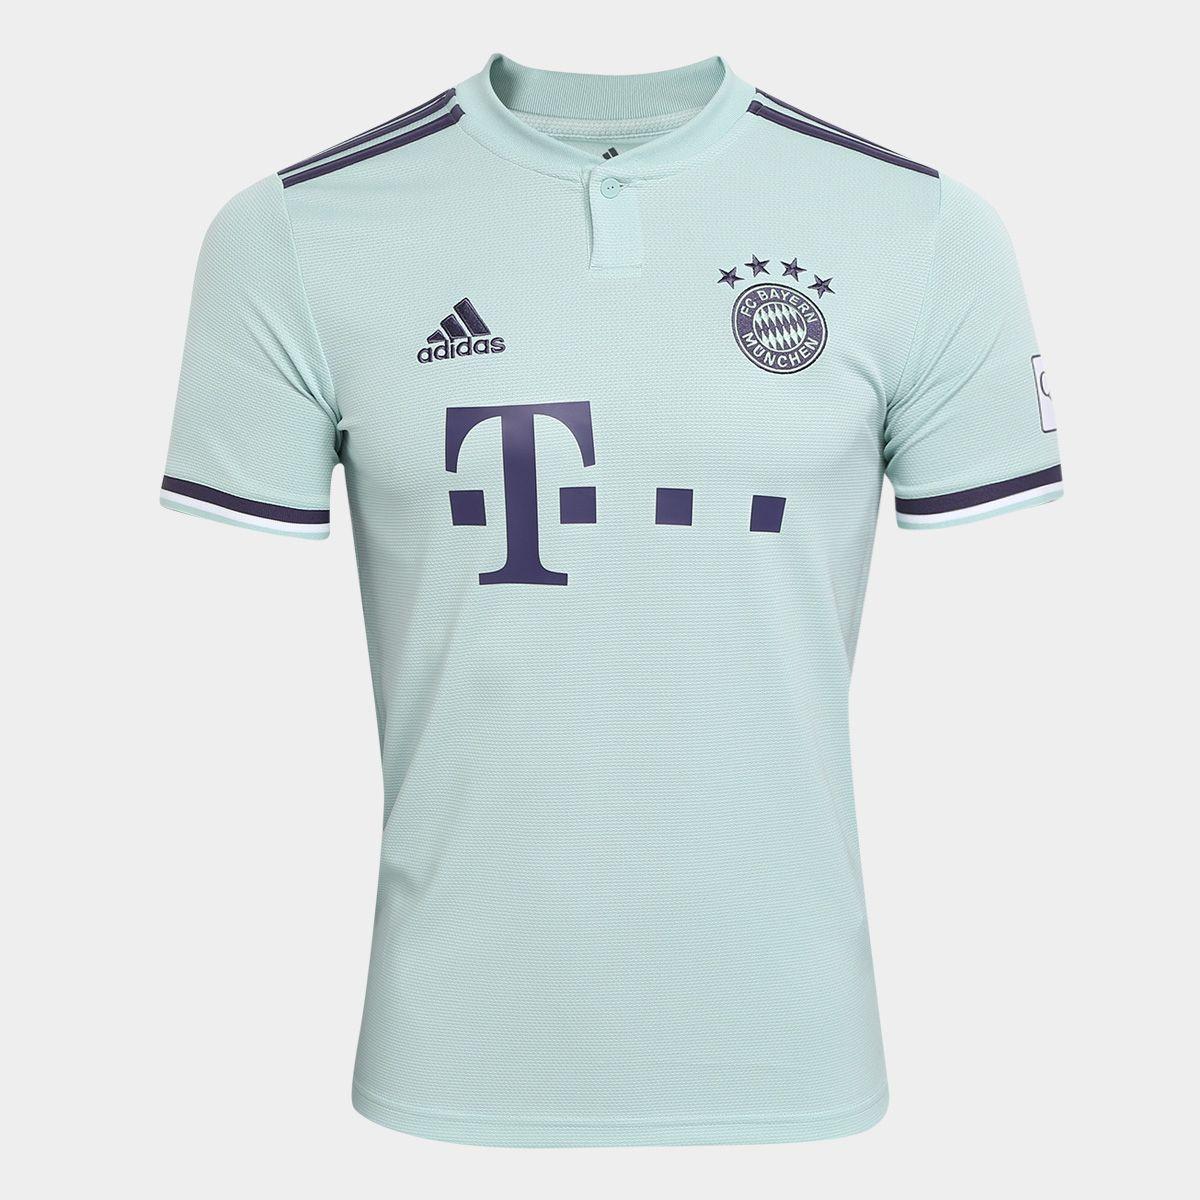 2f3db390e61f8 Camisa Bayern de Munique Away 2018 s/n° - Torcedor Adidas Masculina - Verde